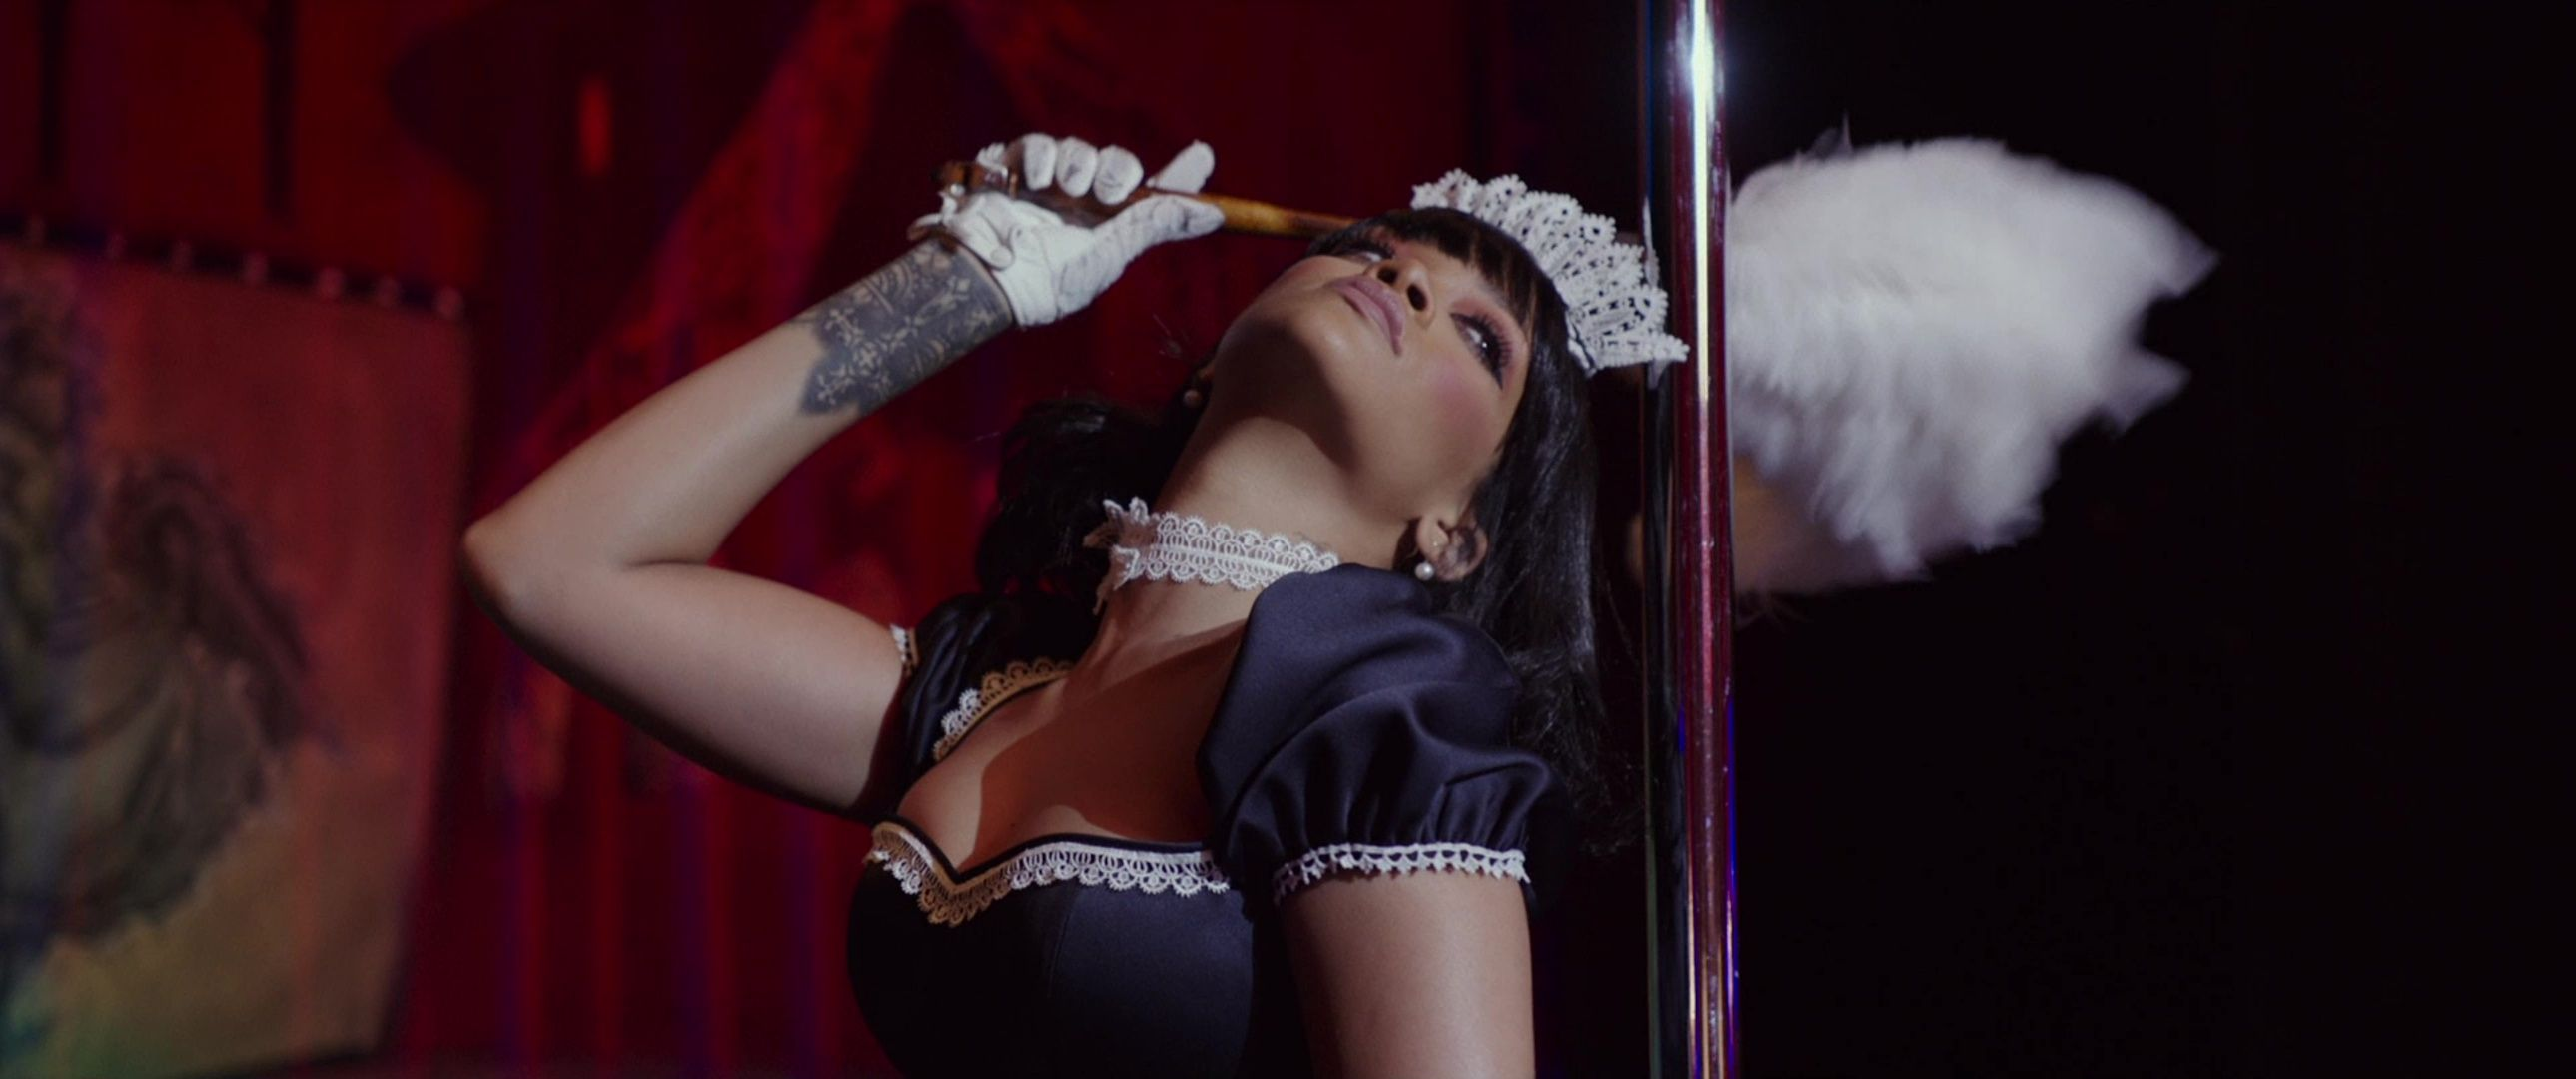 Rihanna-Sexy-39-thefappeningblog.com_.jpg